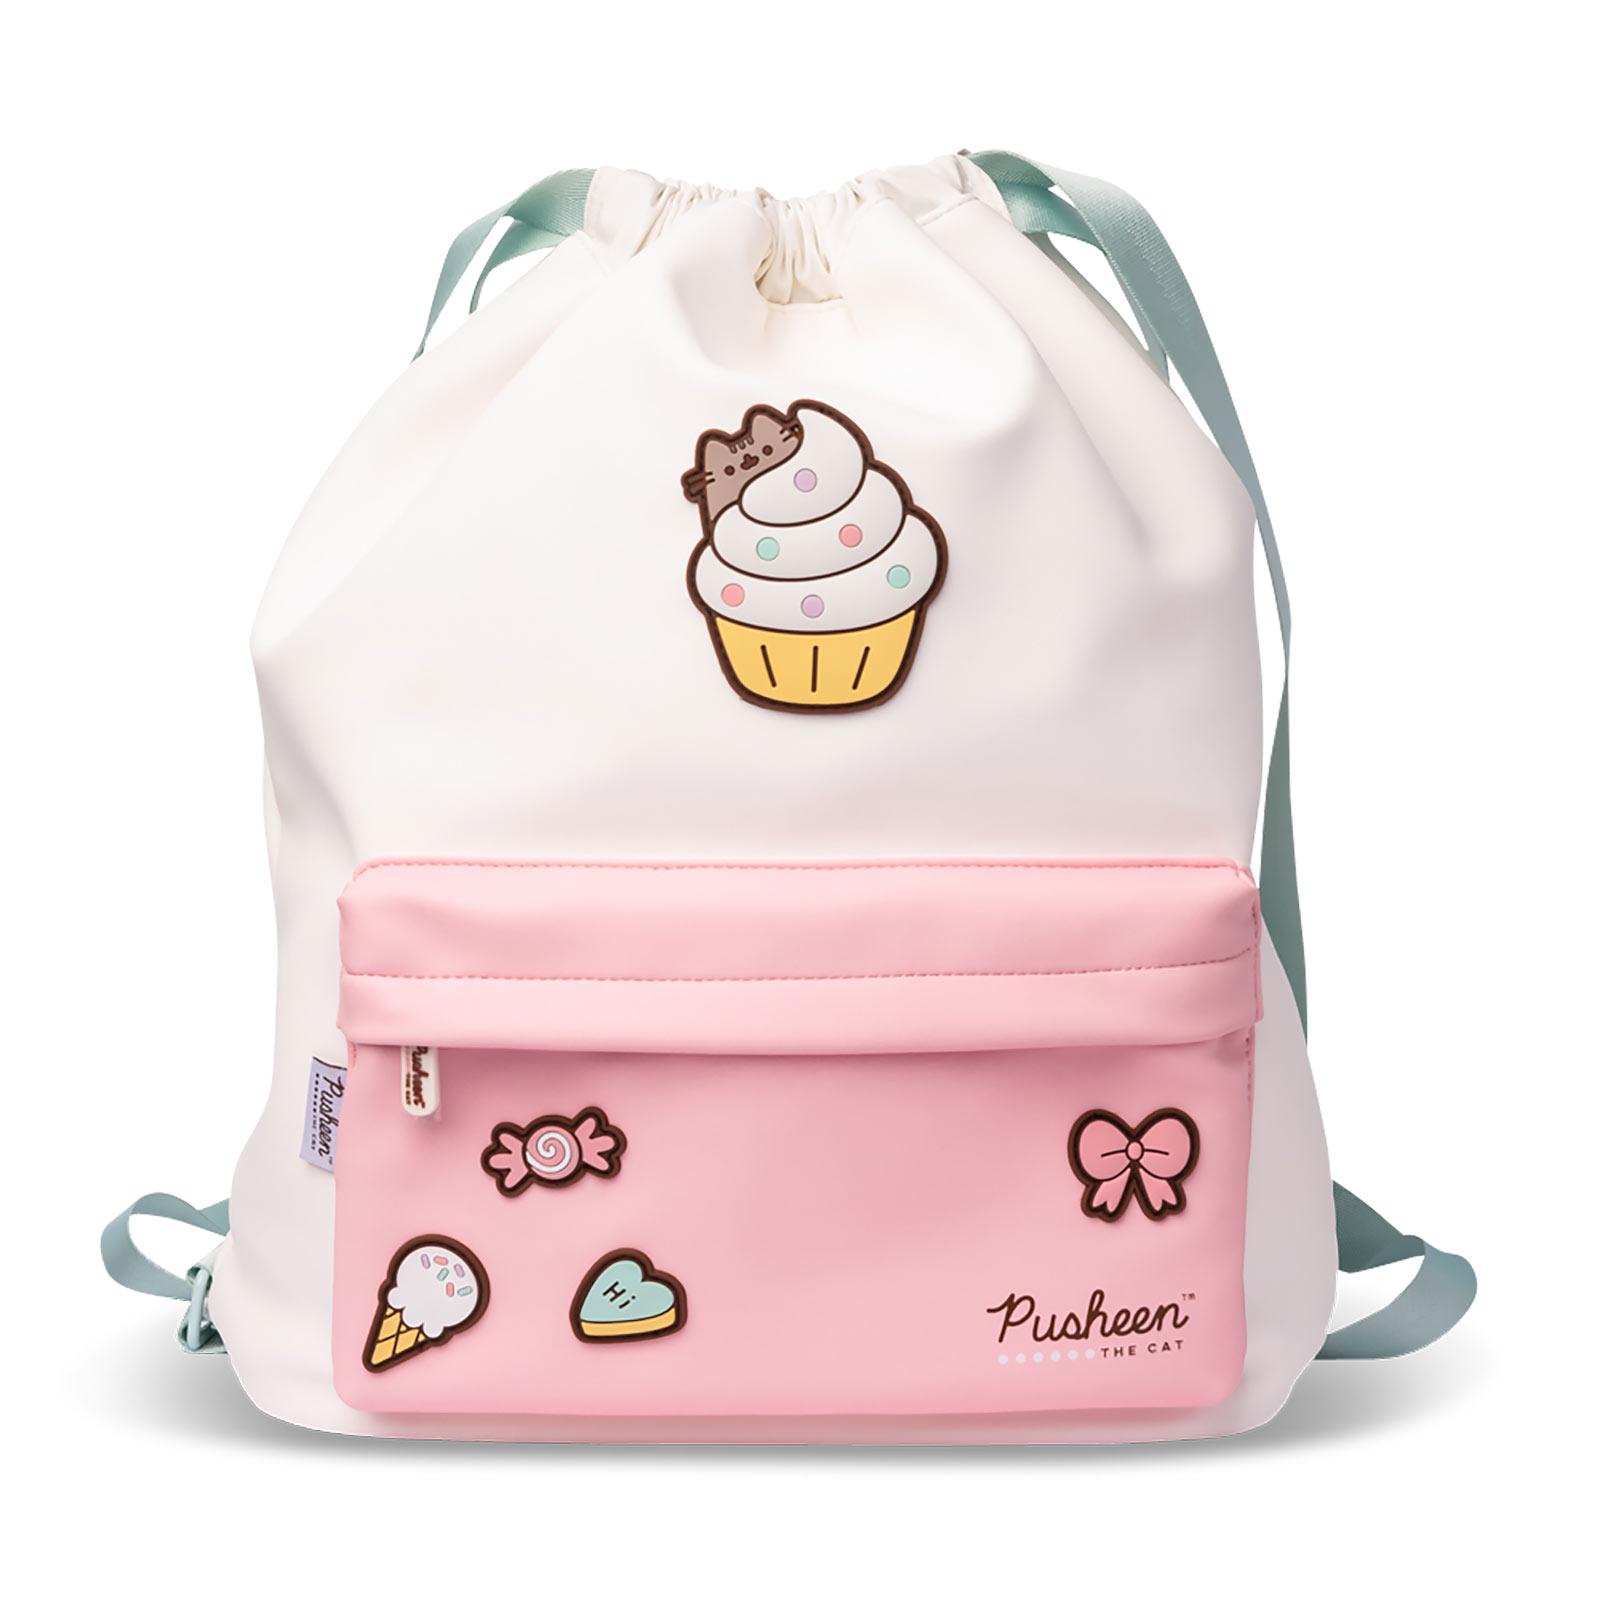 Pusheen - Muffin Sportbag